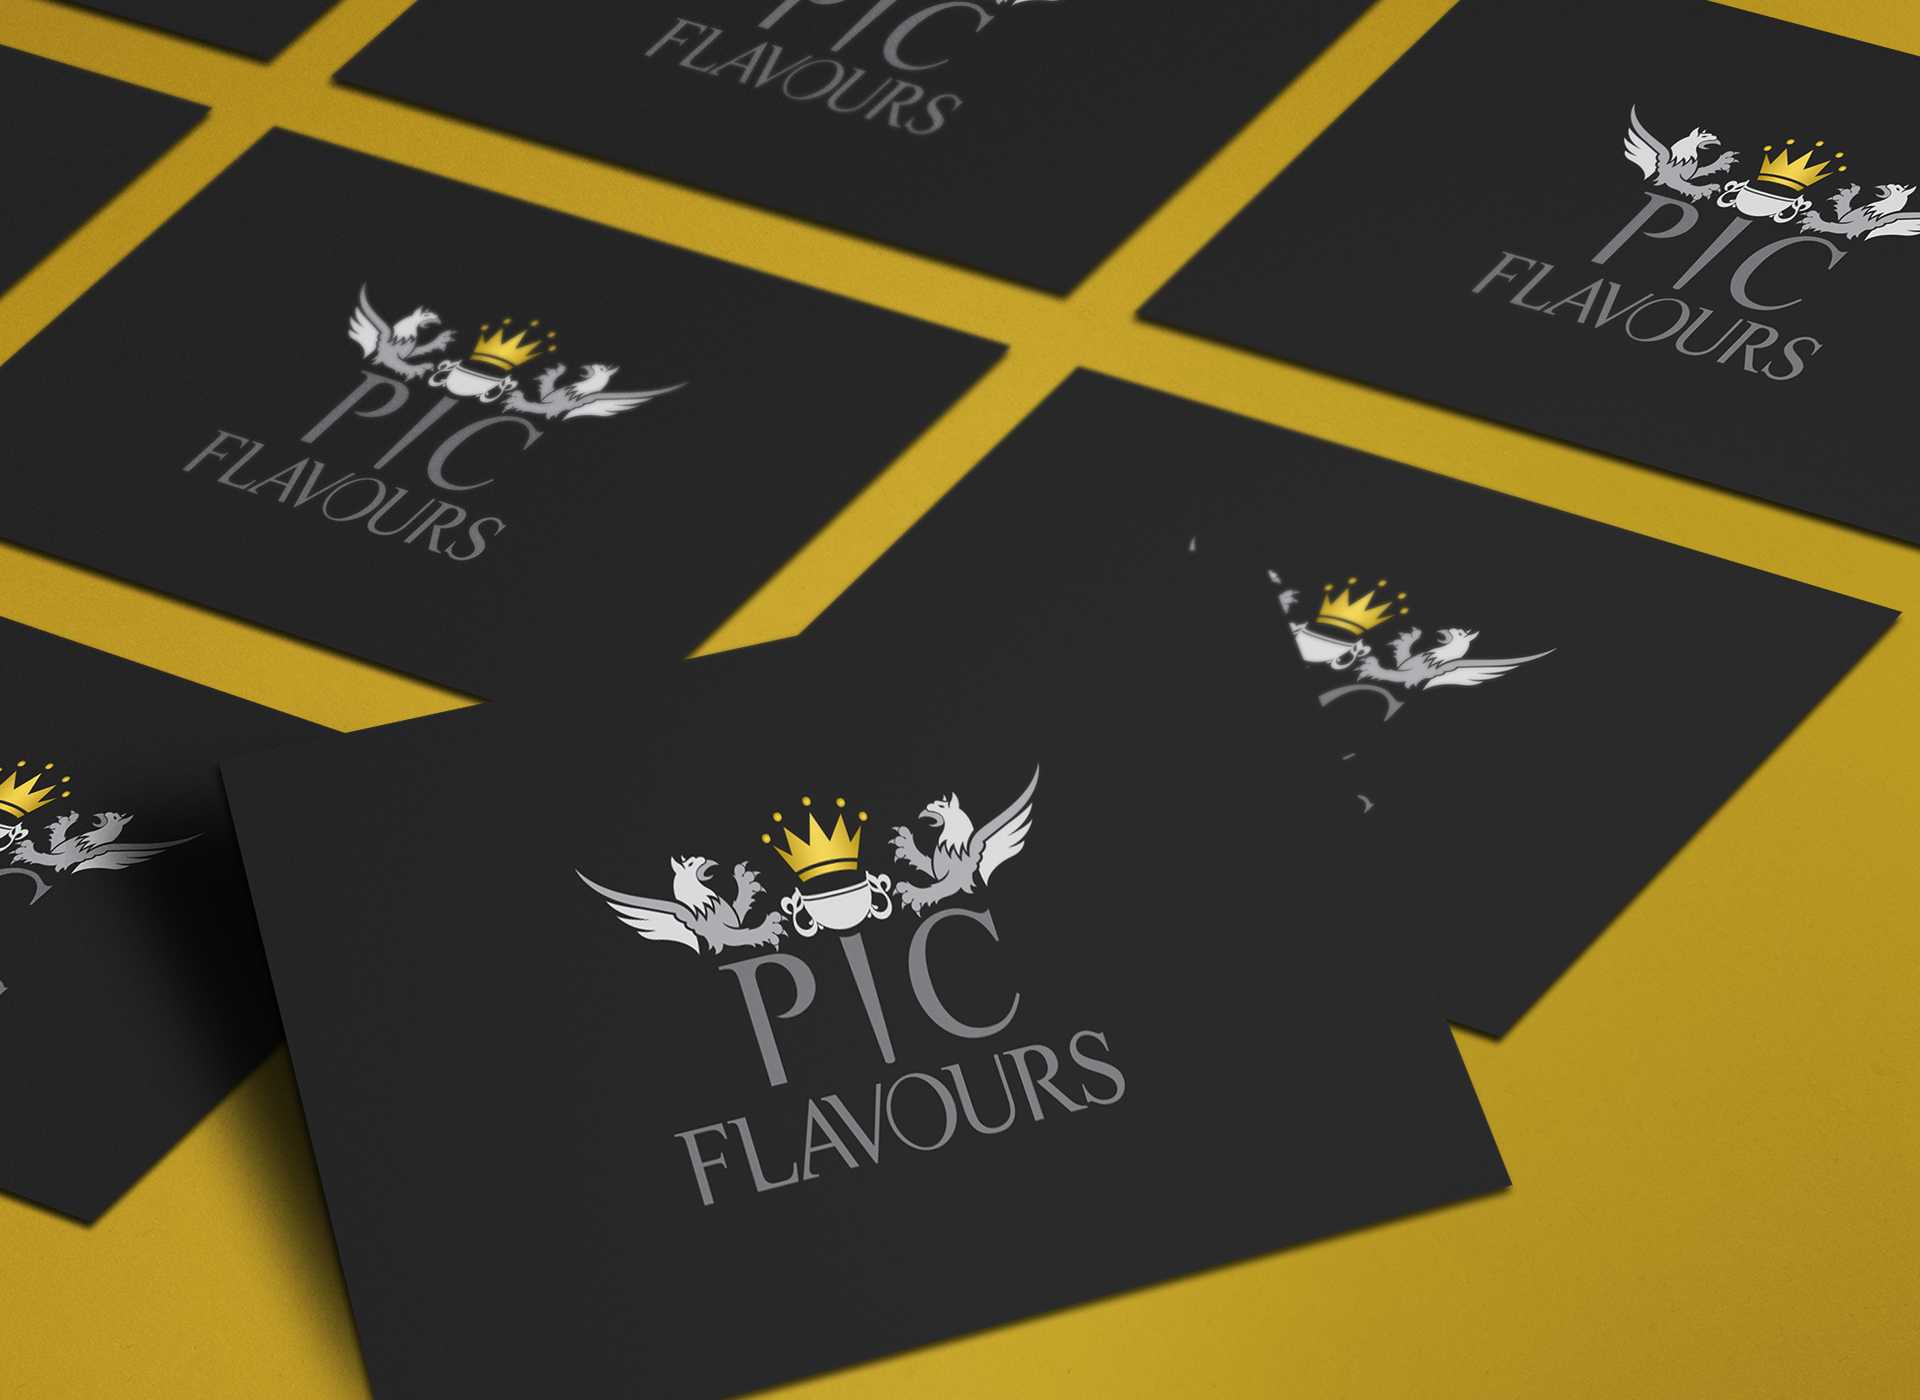 pic flavours business card portofoliu inoveo